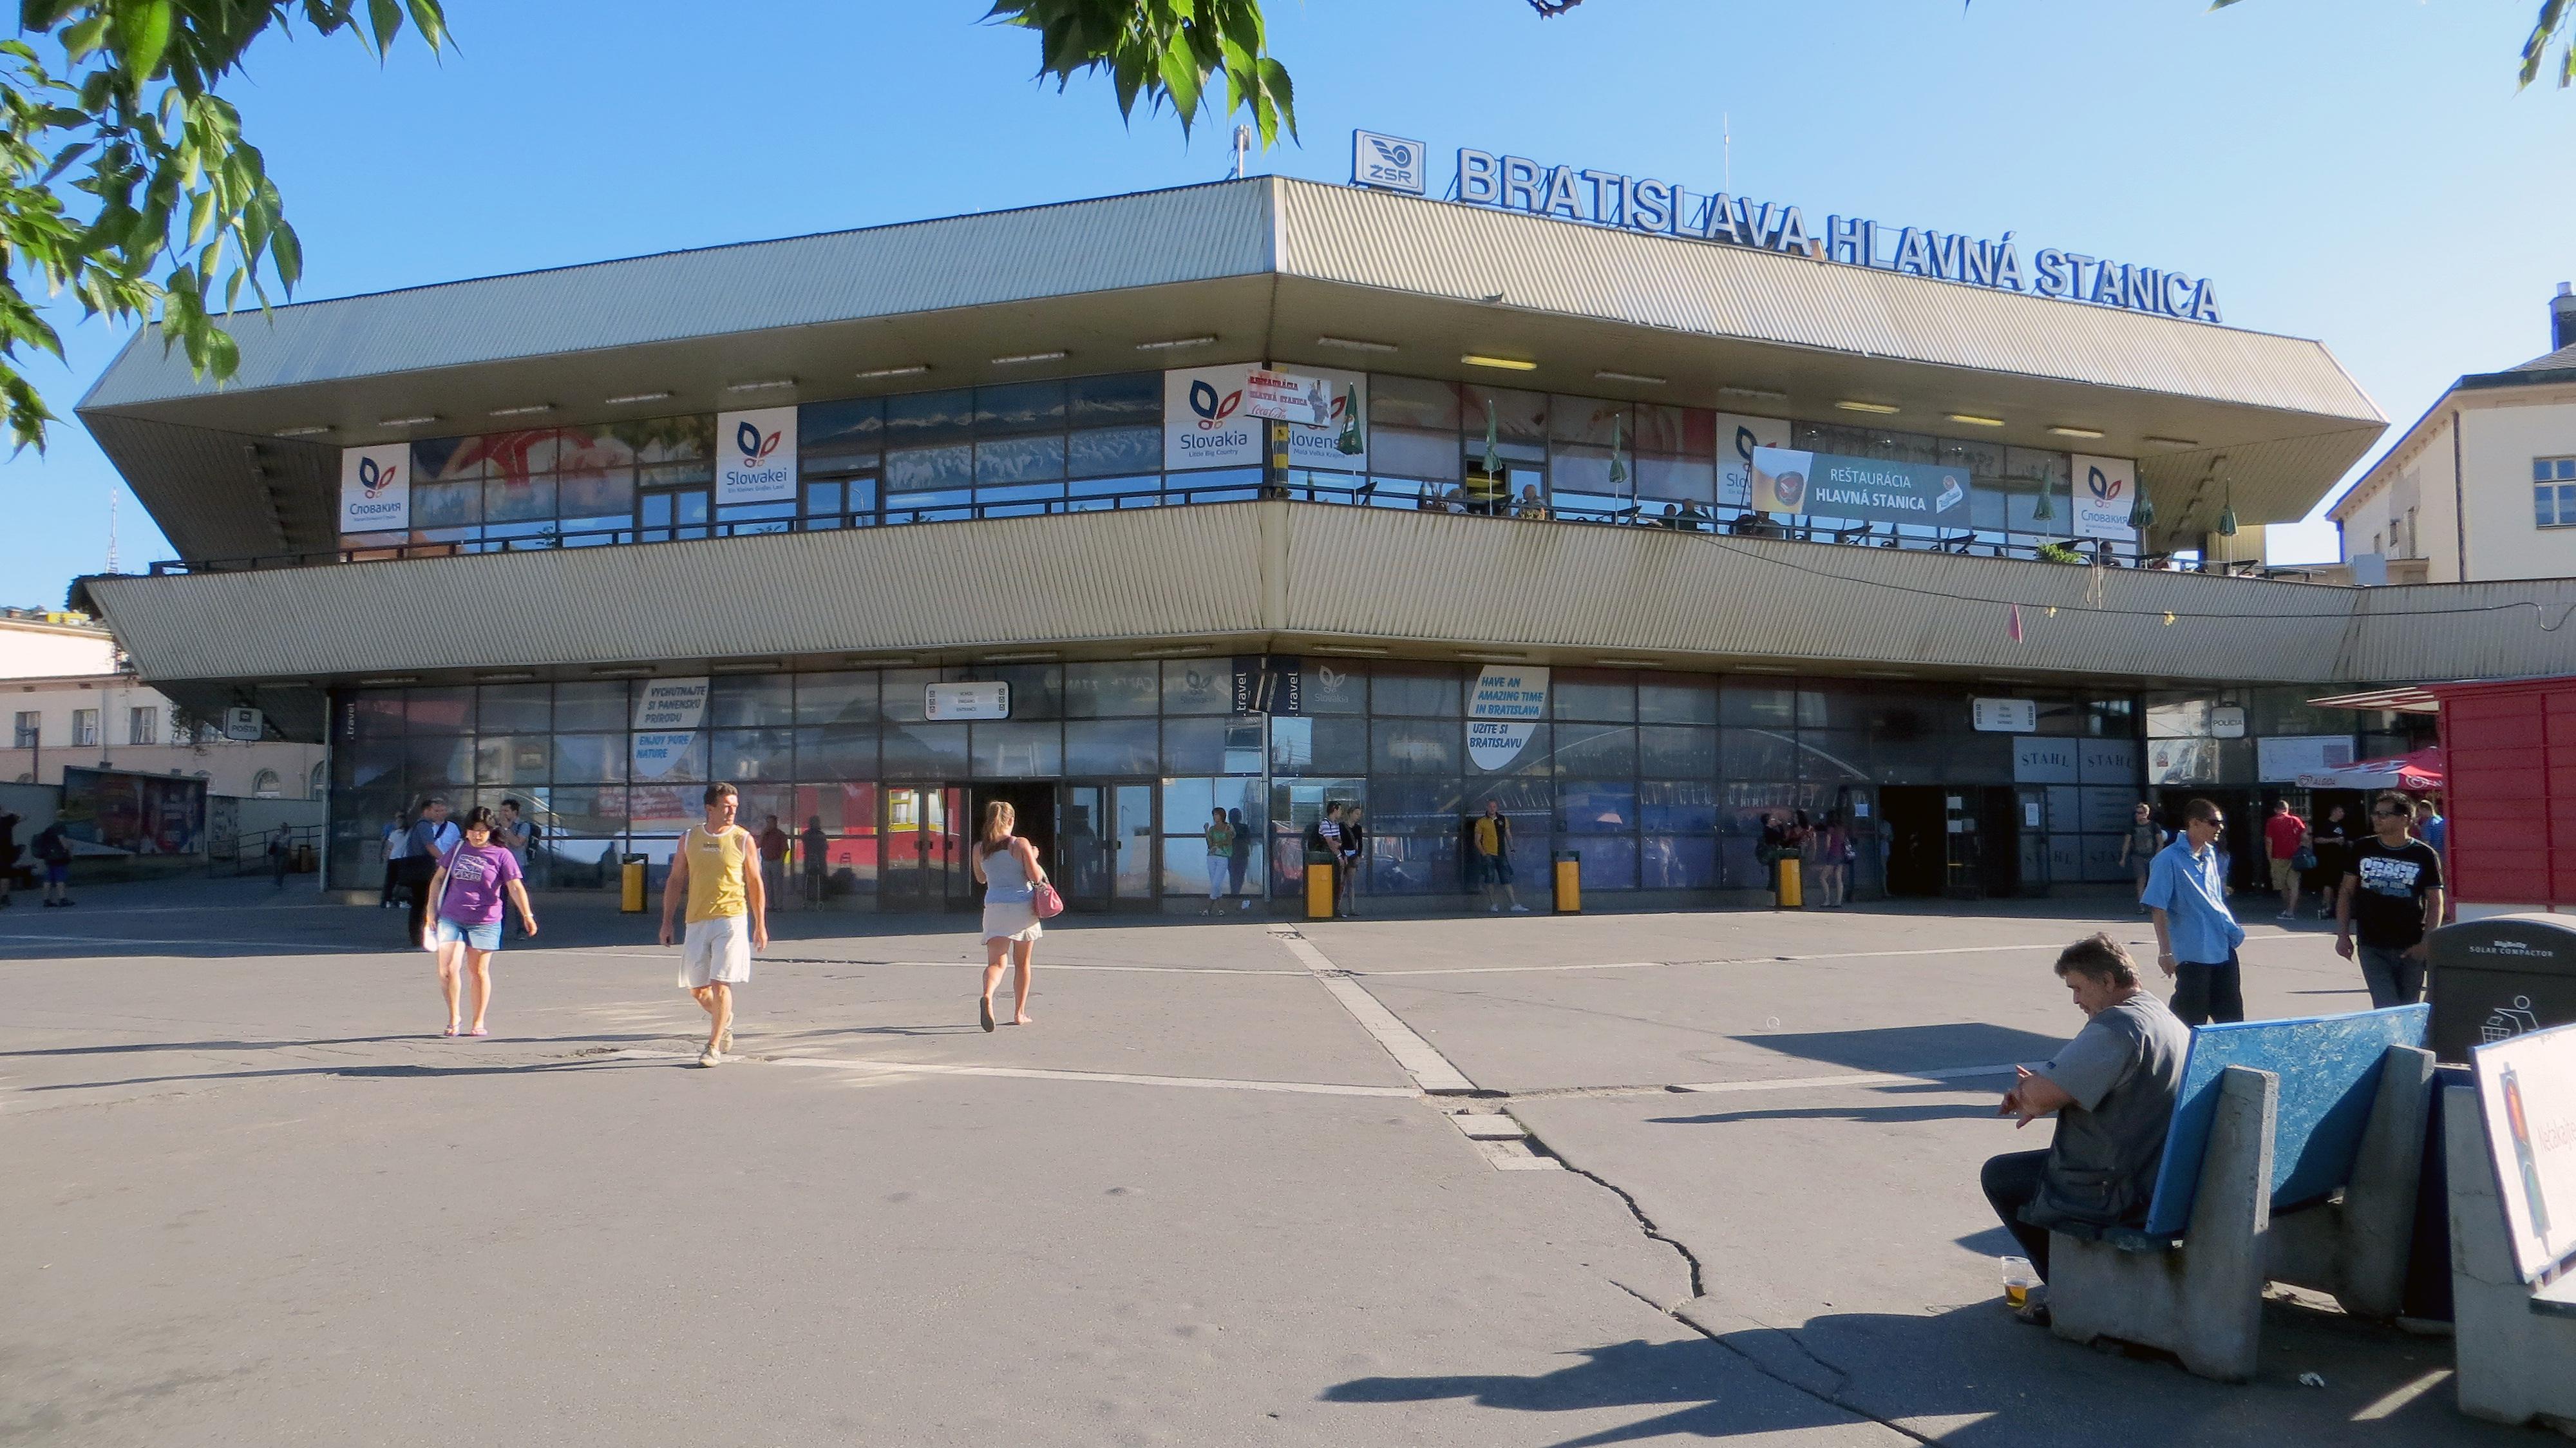 Trainstationspotting - Bratislava train station, Slovakia, 2013